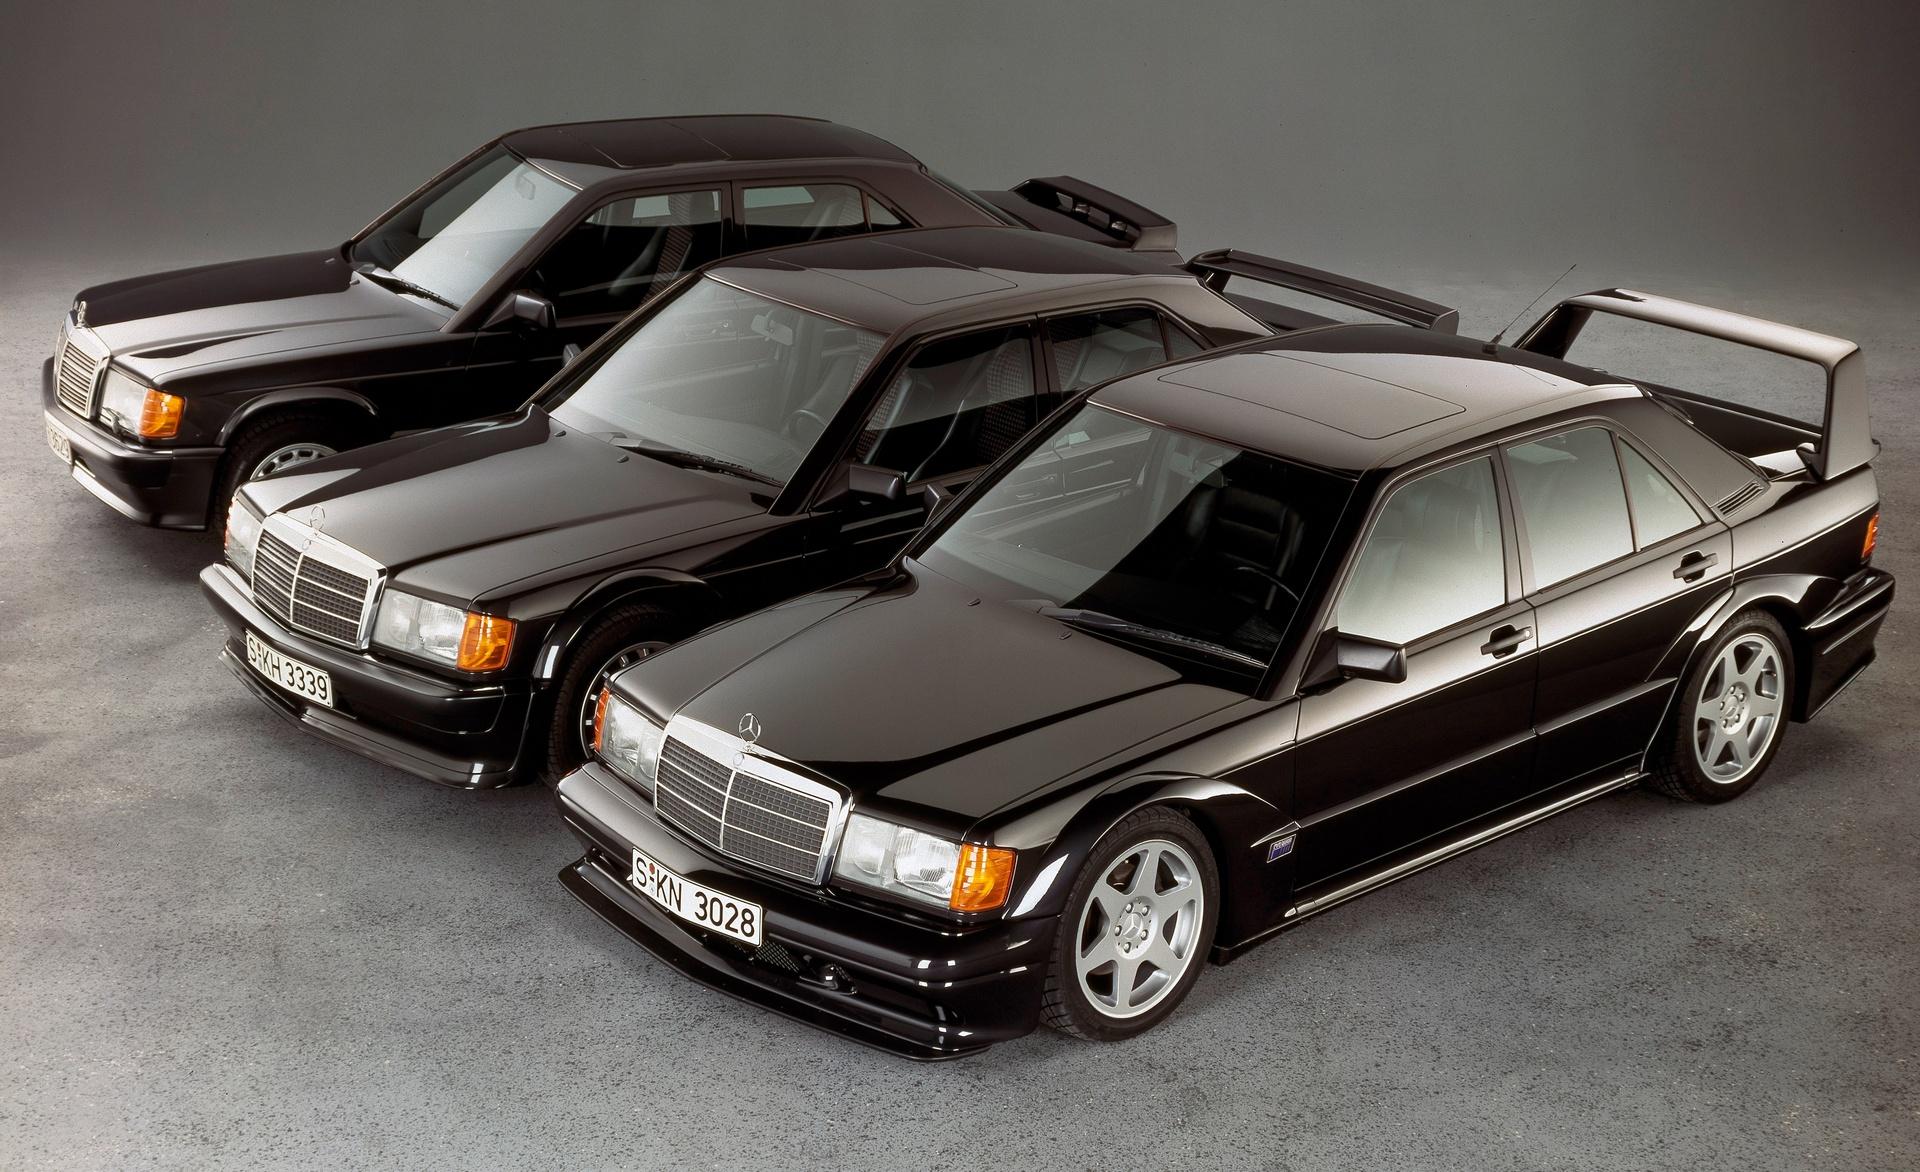 Mercedes 190 E 2.3-16 - Mercedes 190 E 2.5-16 Evolution - Mercedes 190 E 2.3-16 Evolution II